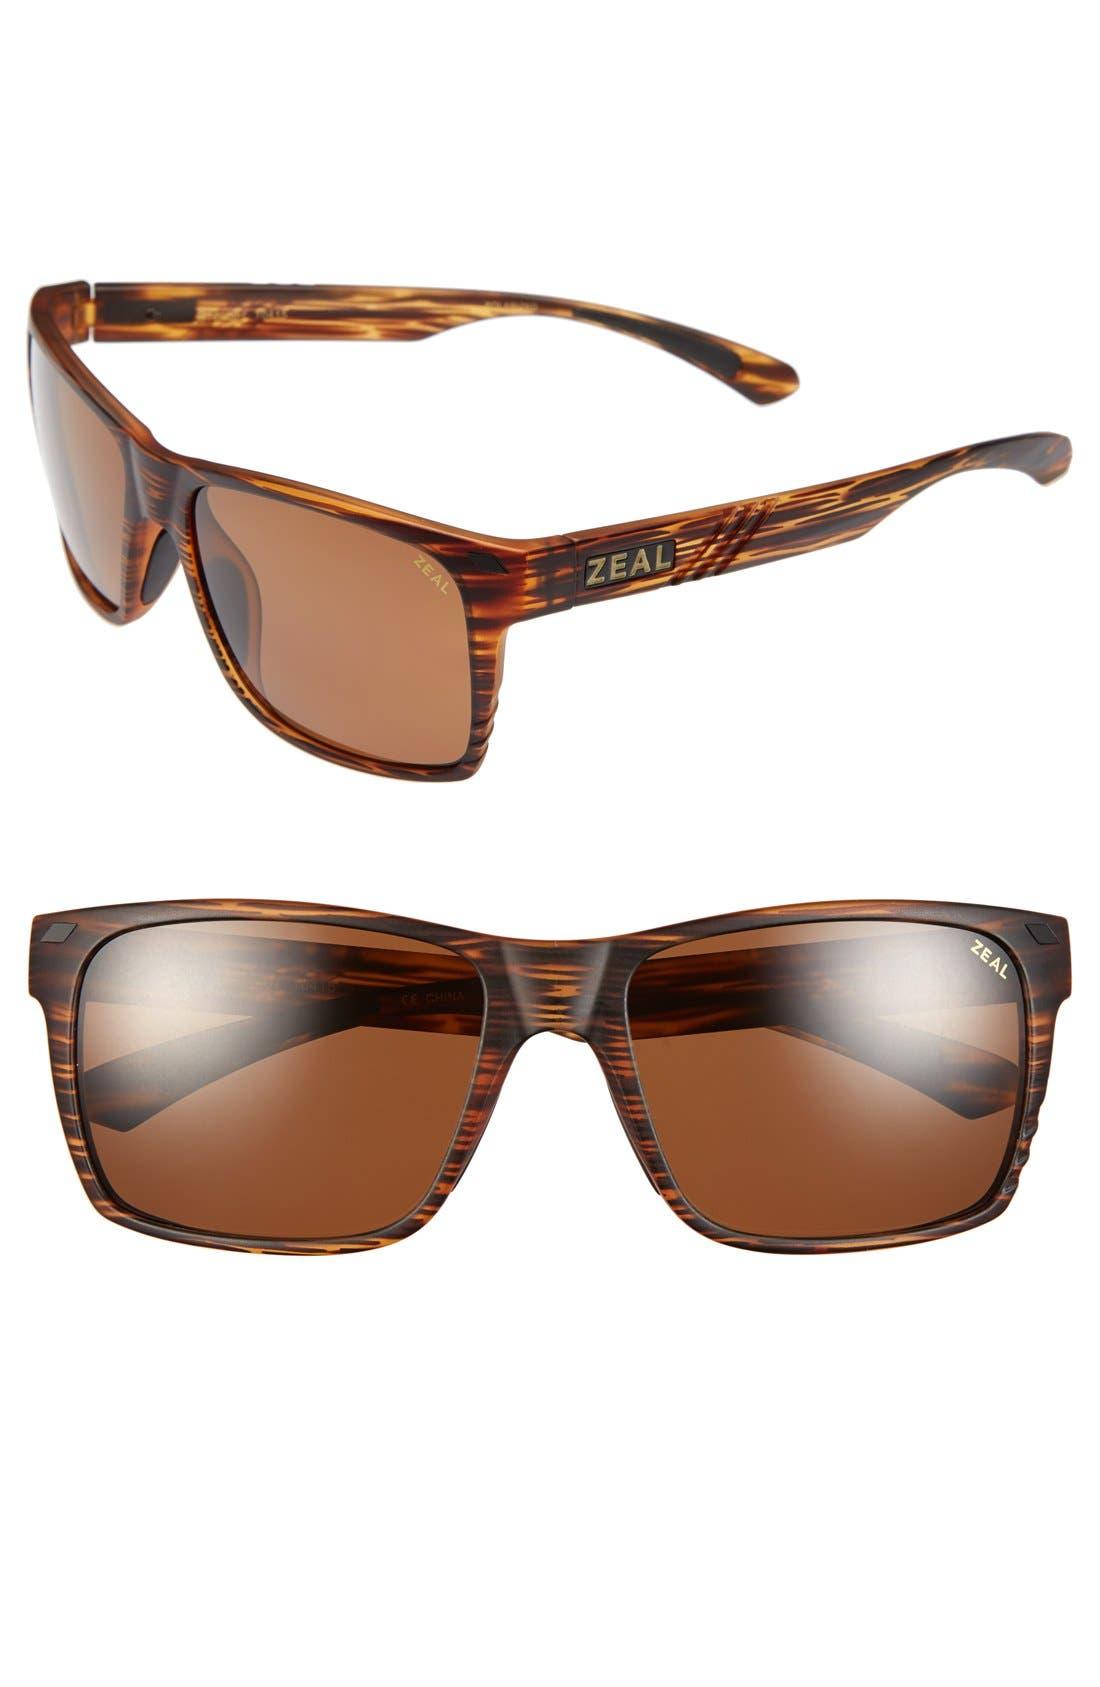 Alternate Image 1 Selected - Zeal Optics 'Brewer' 57mm Polarized Plant Based Sunglasses